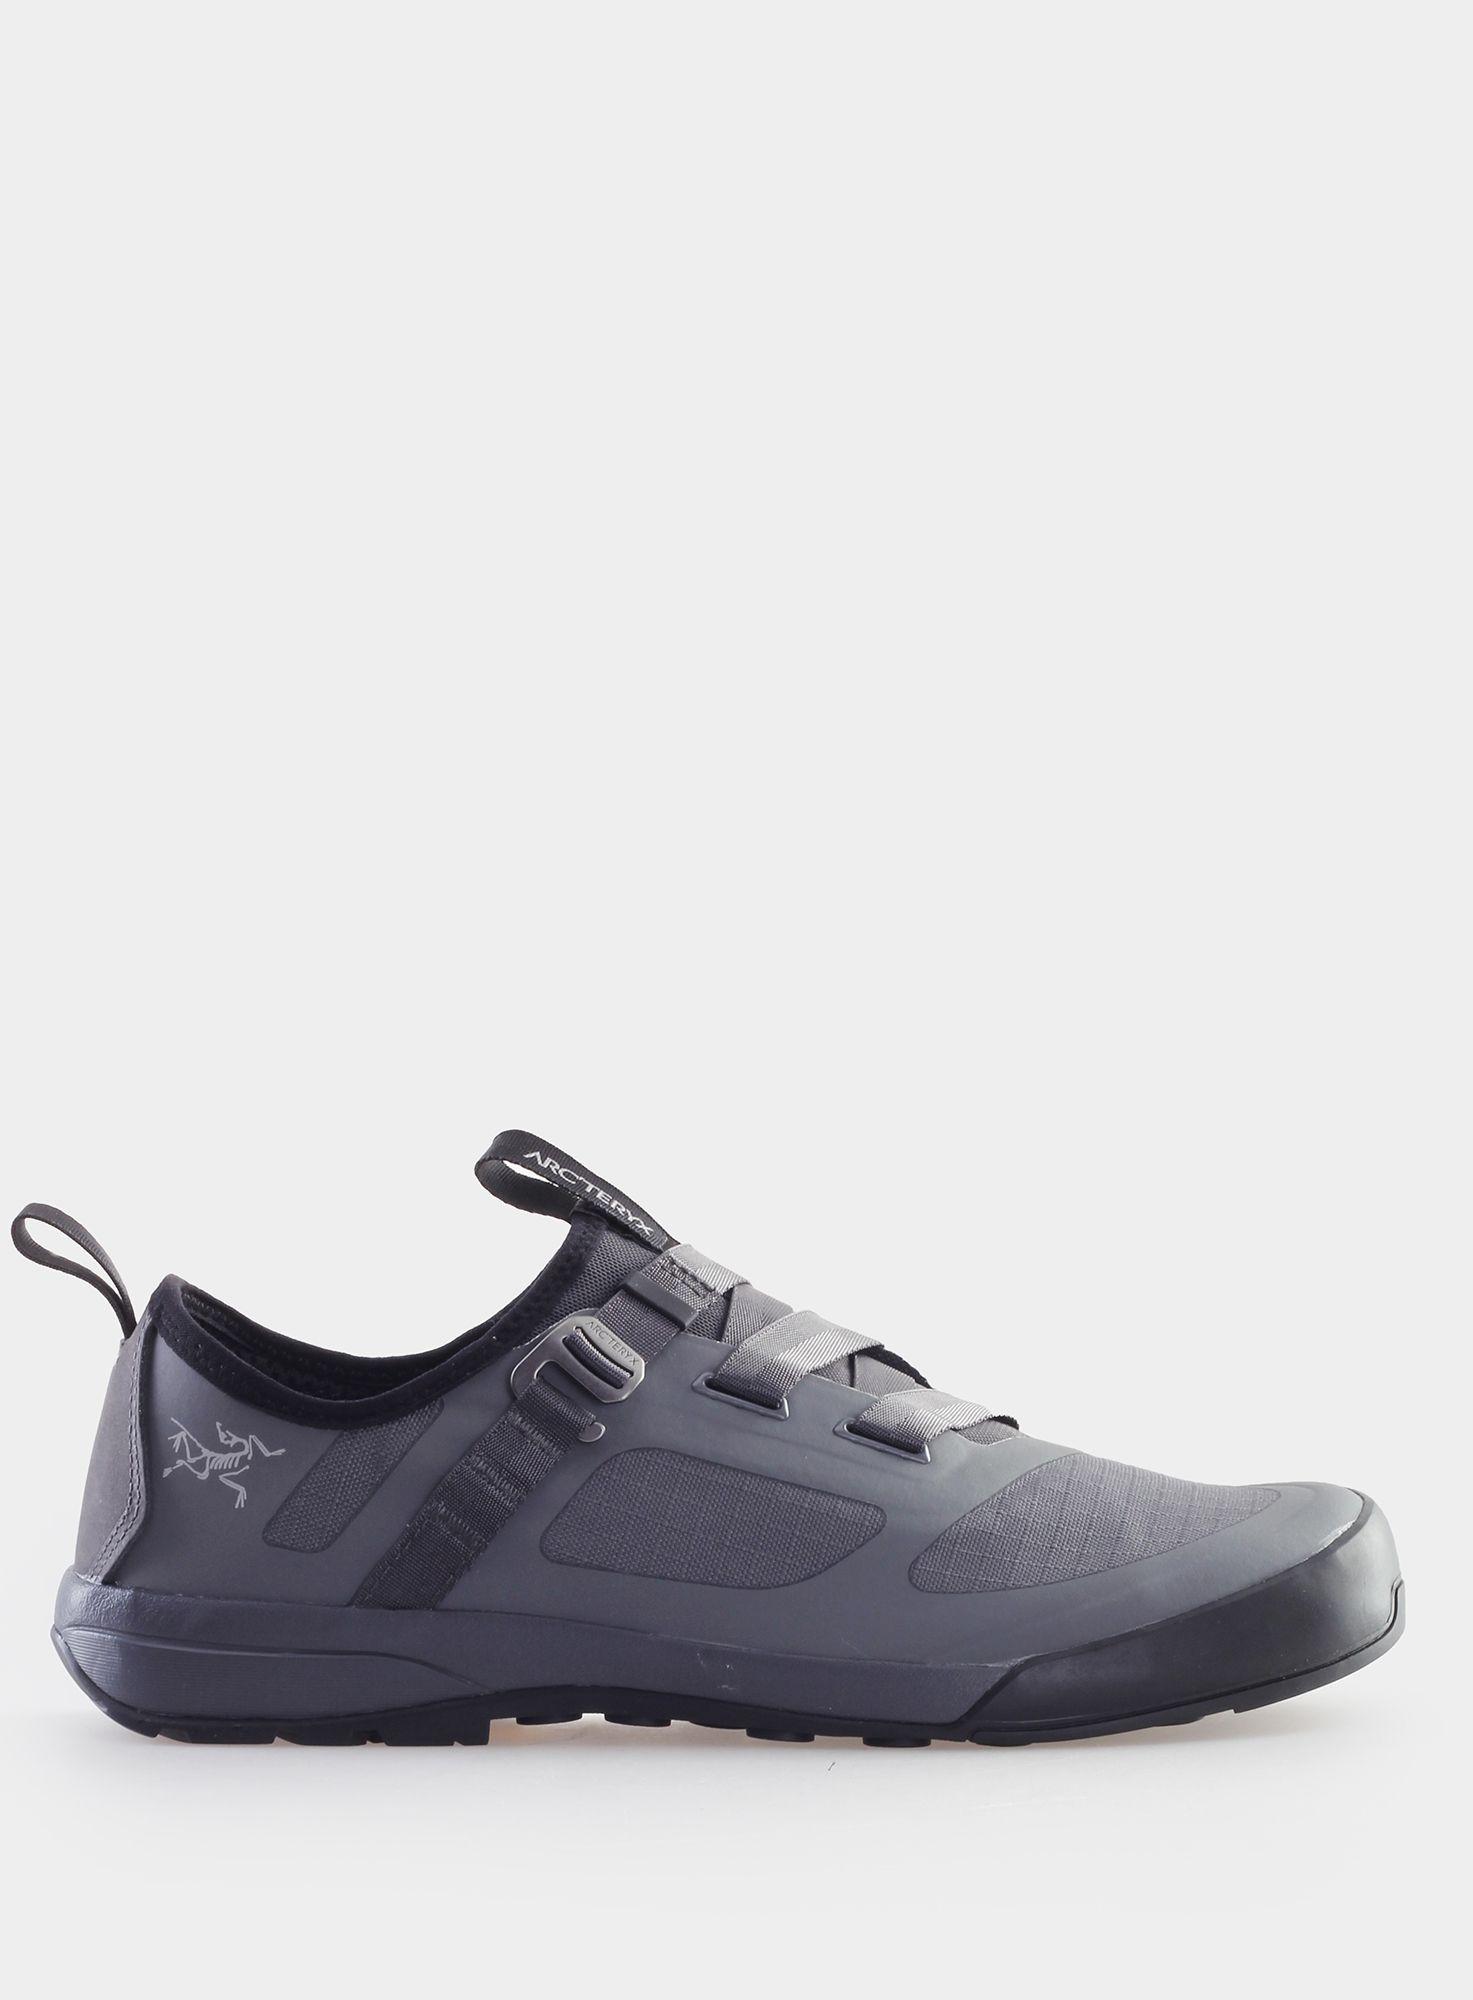 Arcteryx Arakys Minimal Shoes Designer Shoes Shoes